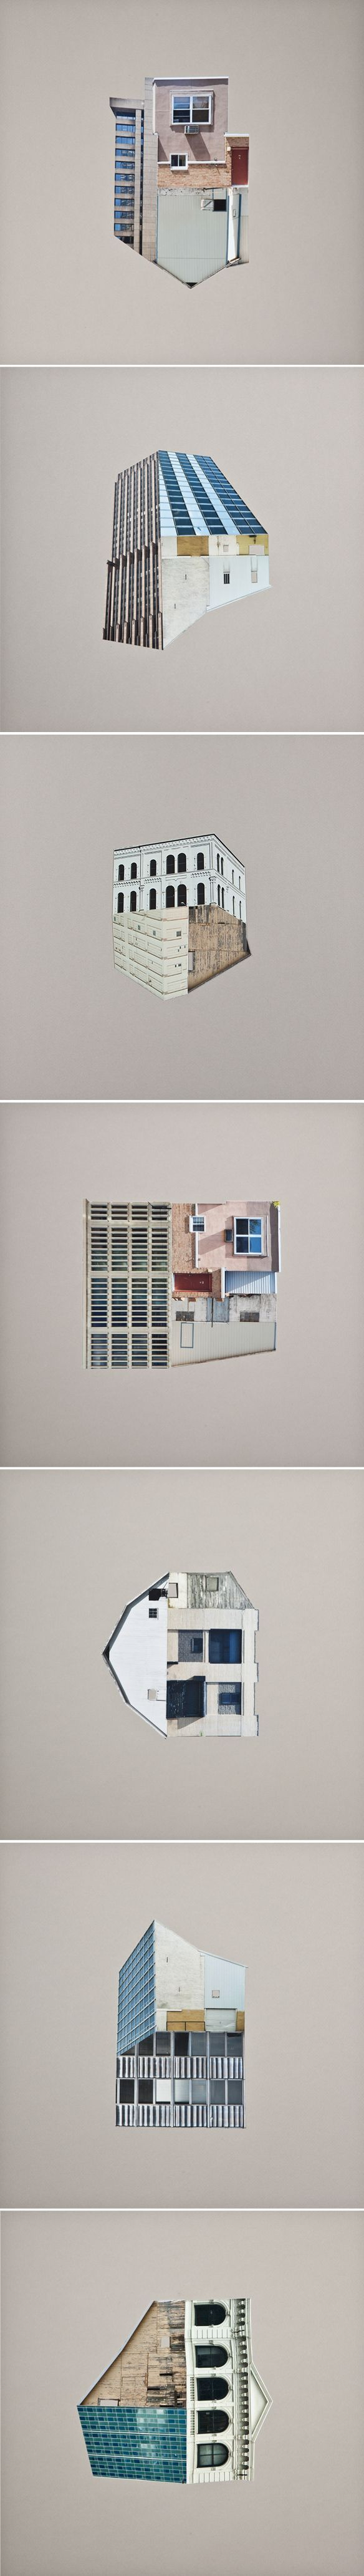 collages by krista svalbonas